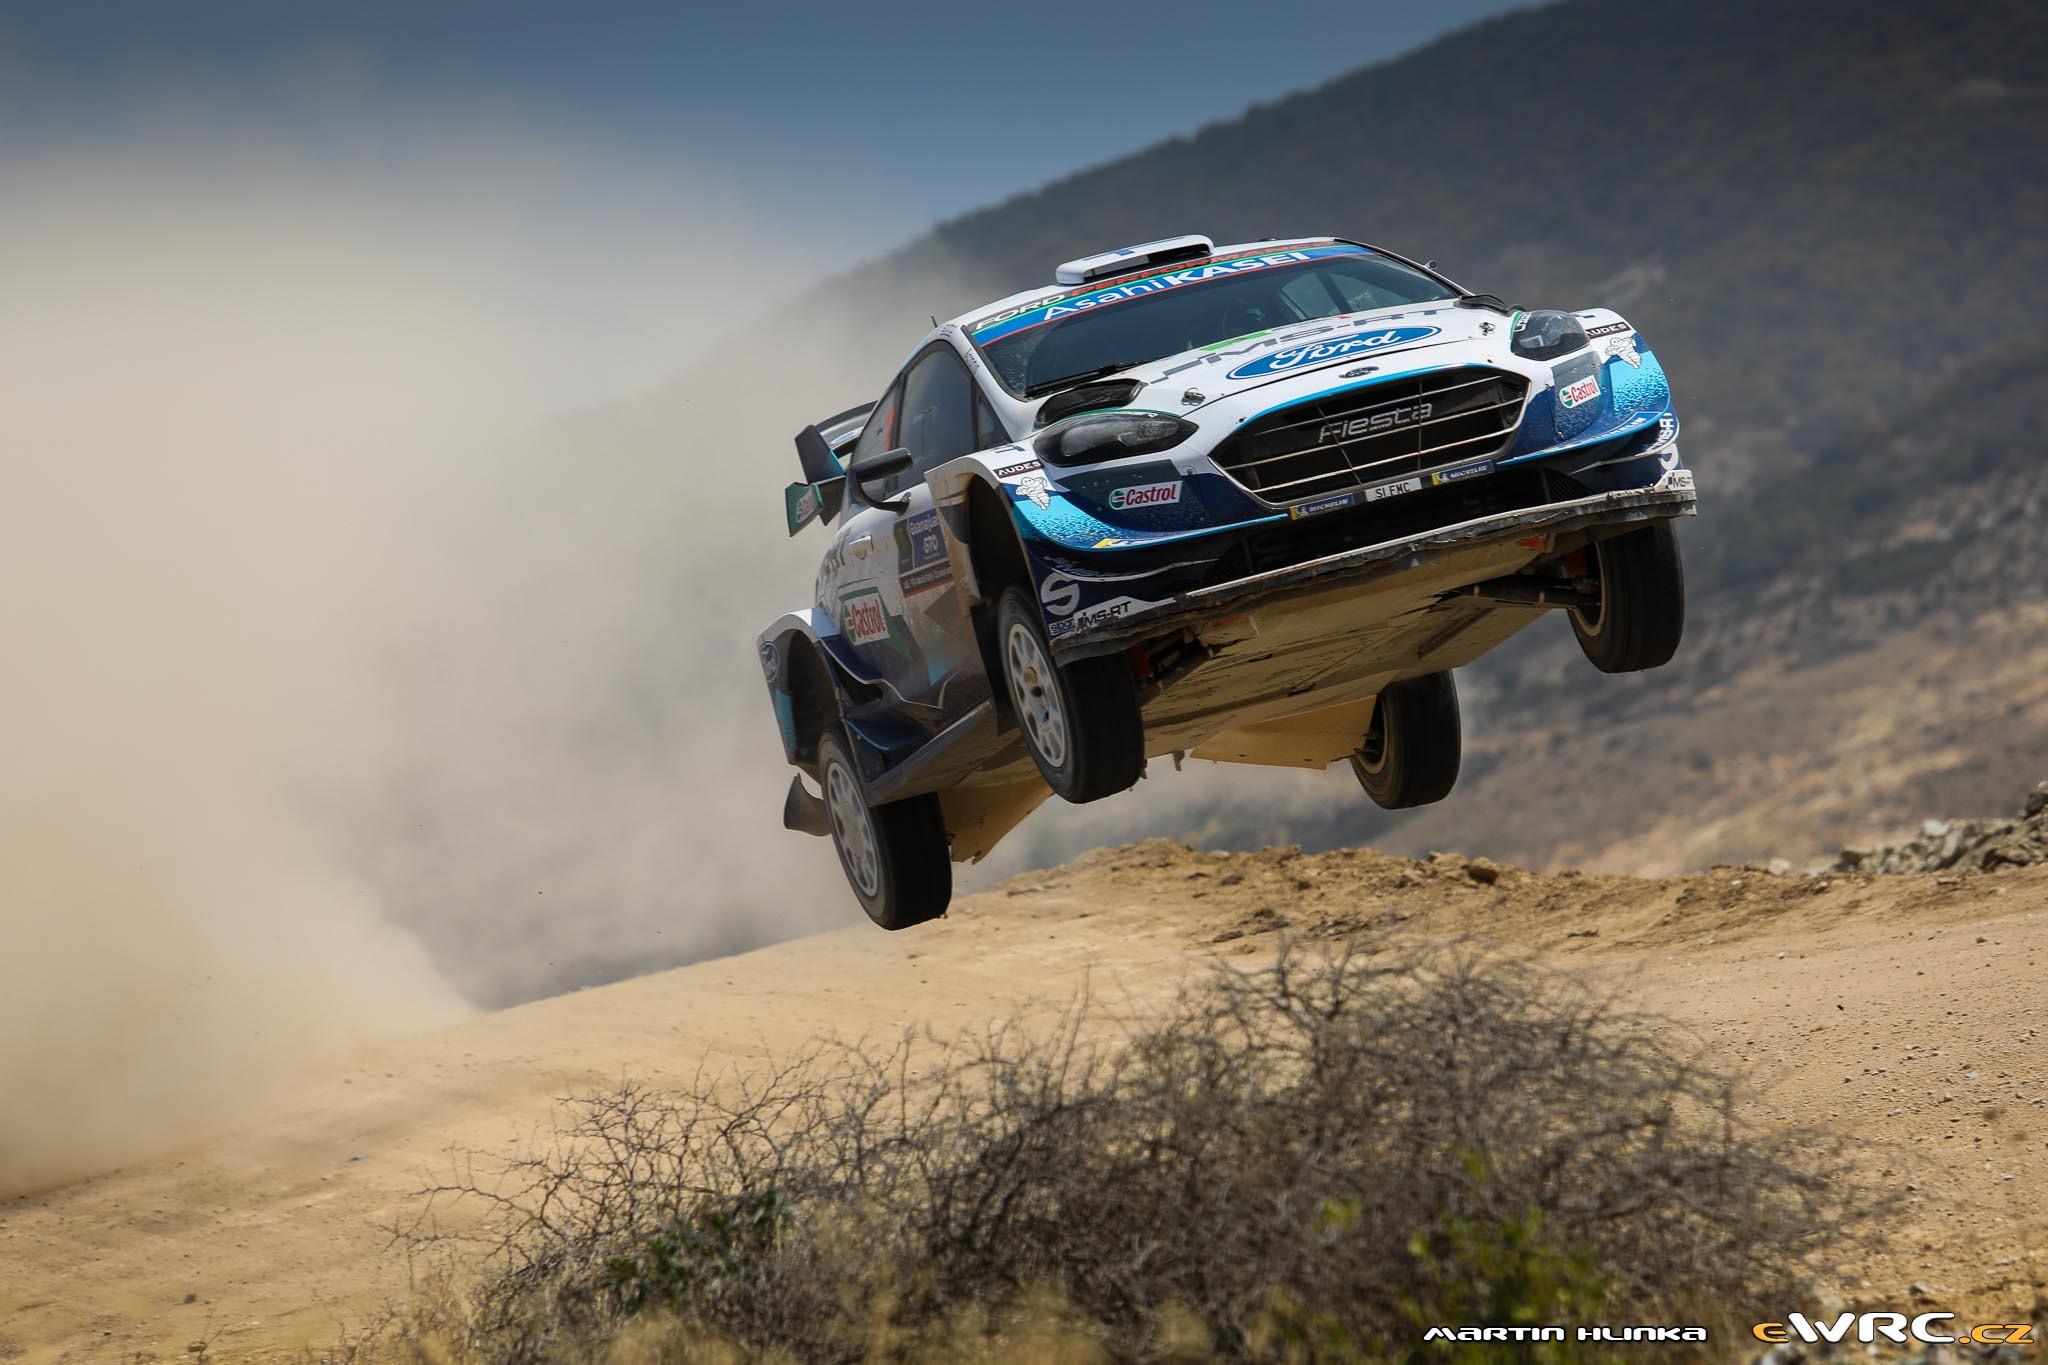 WRC: 17º Rallye Guanajuato Corona - México [12-15 Marzo] - Página 5 Mhl_9b2a0885